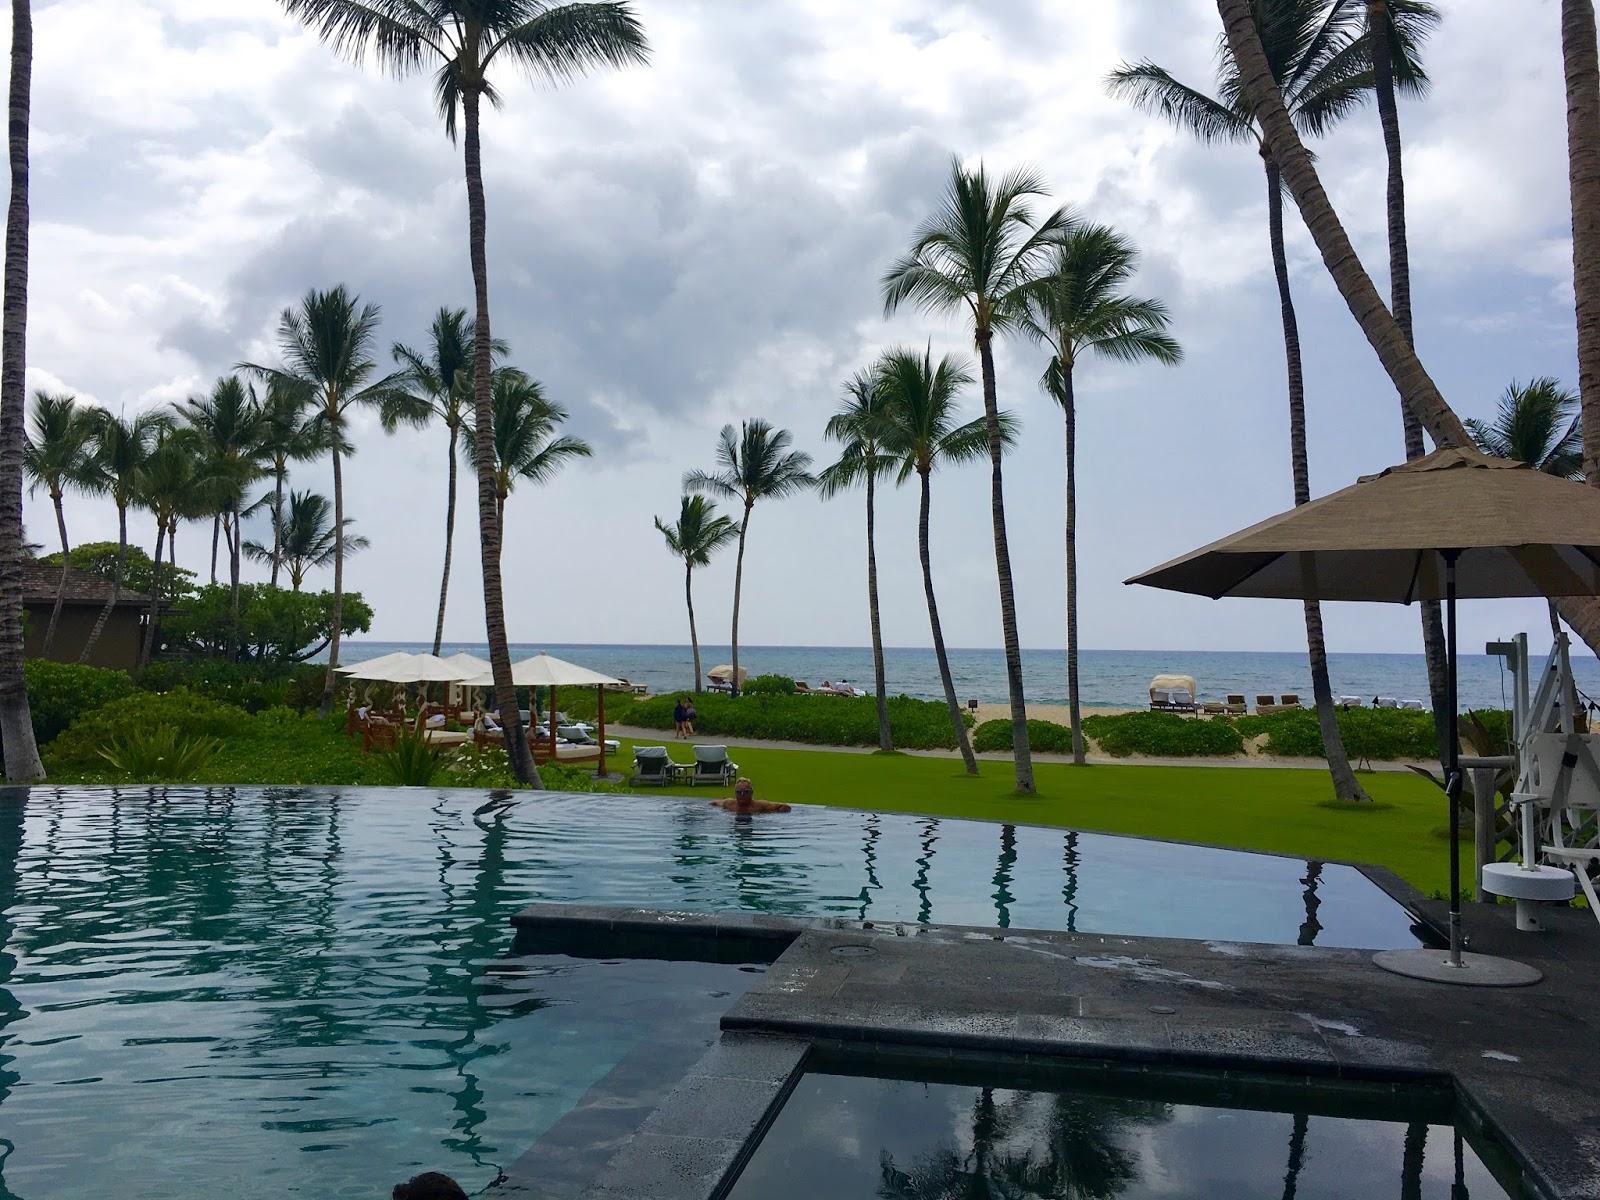 Hawaii Beach Hut Als The Best Beaches In World